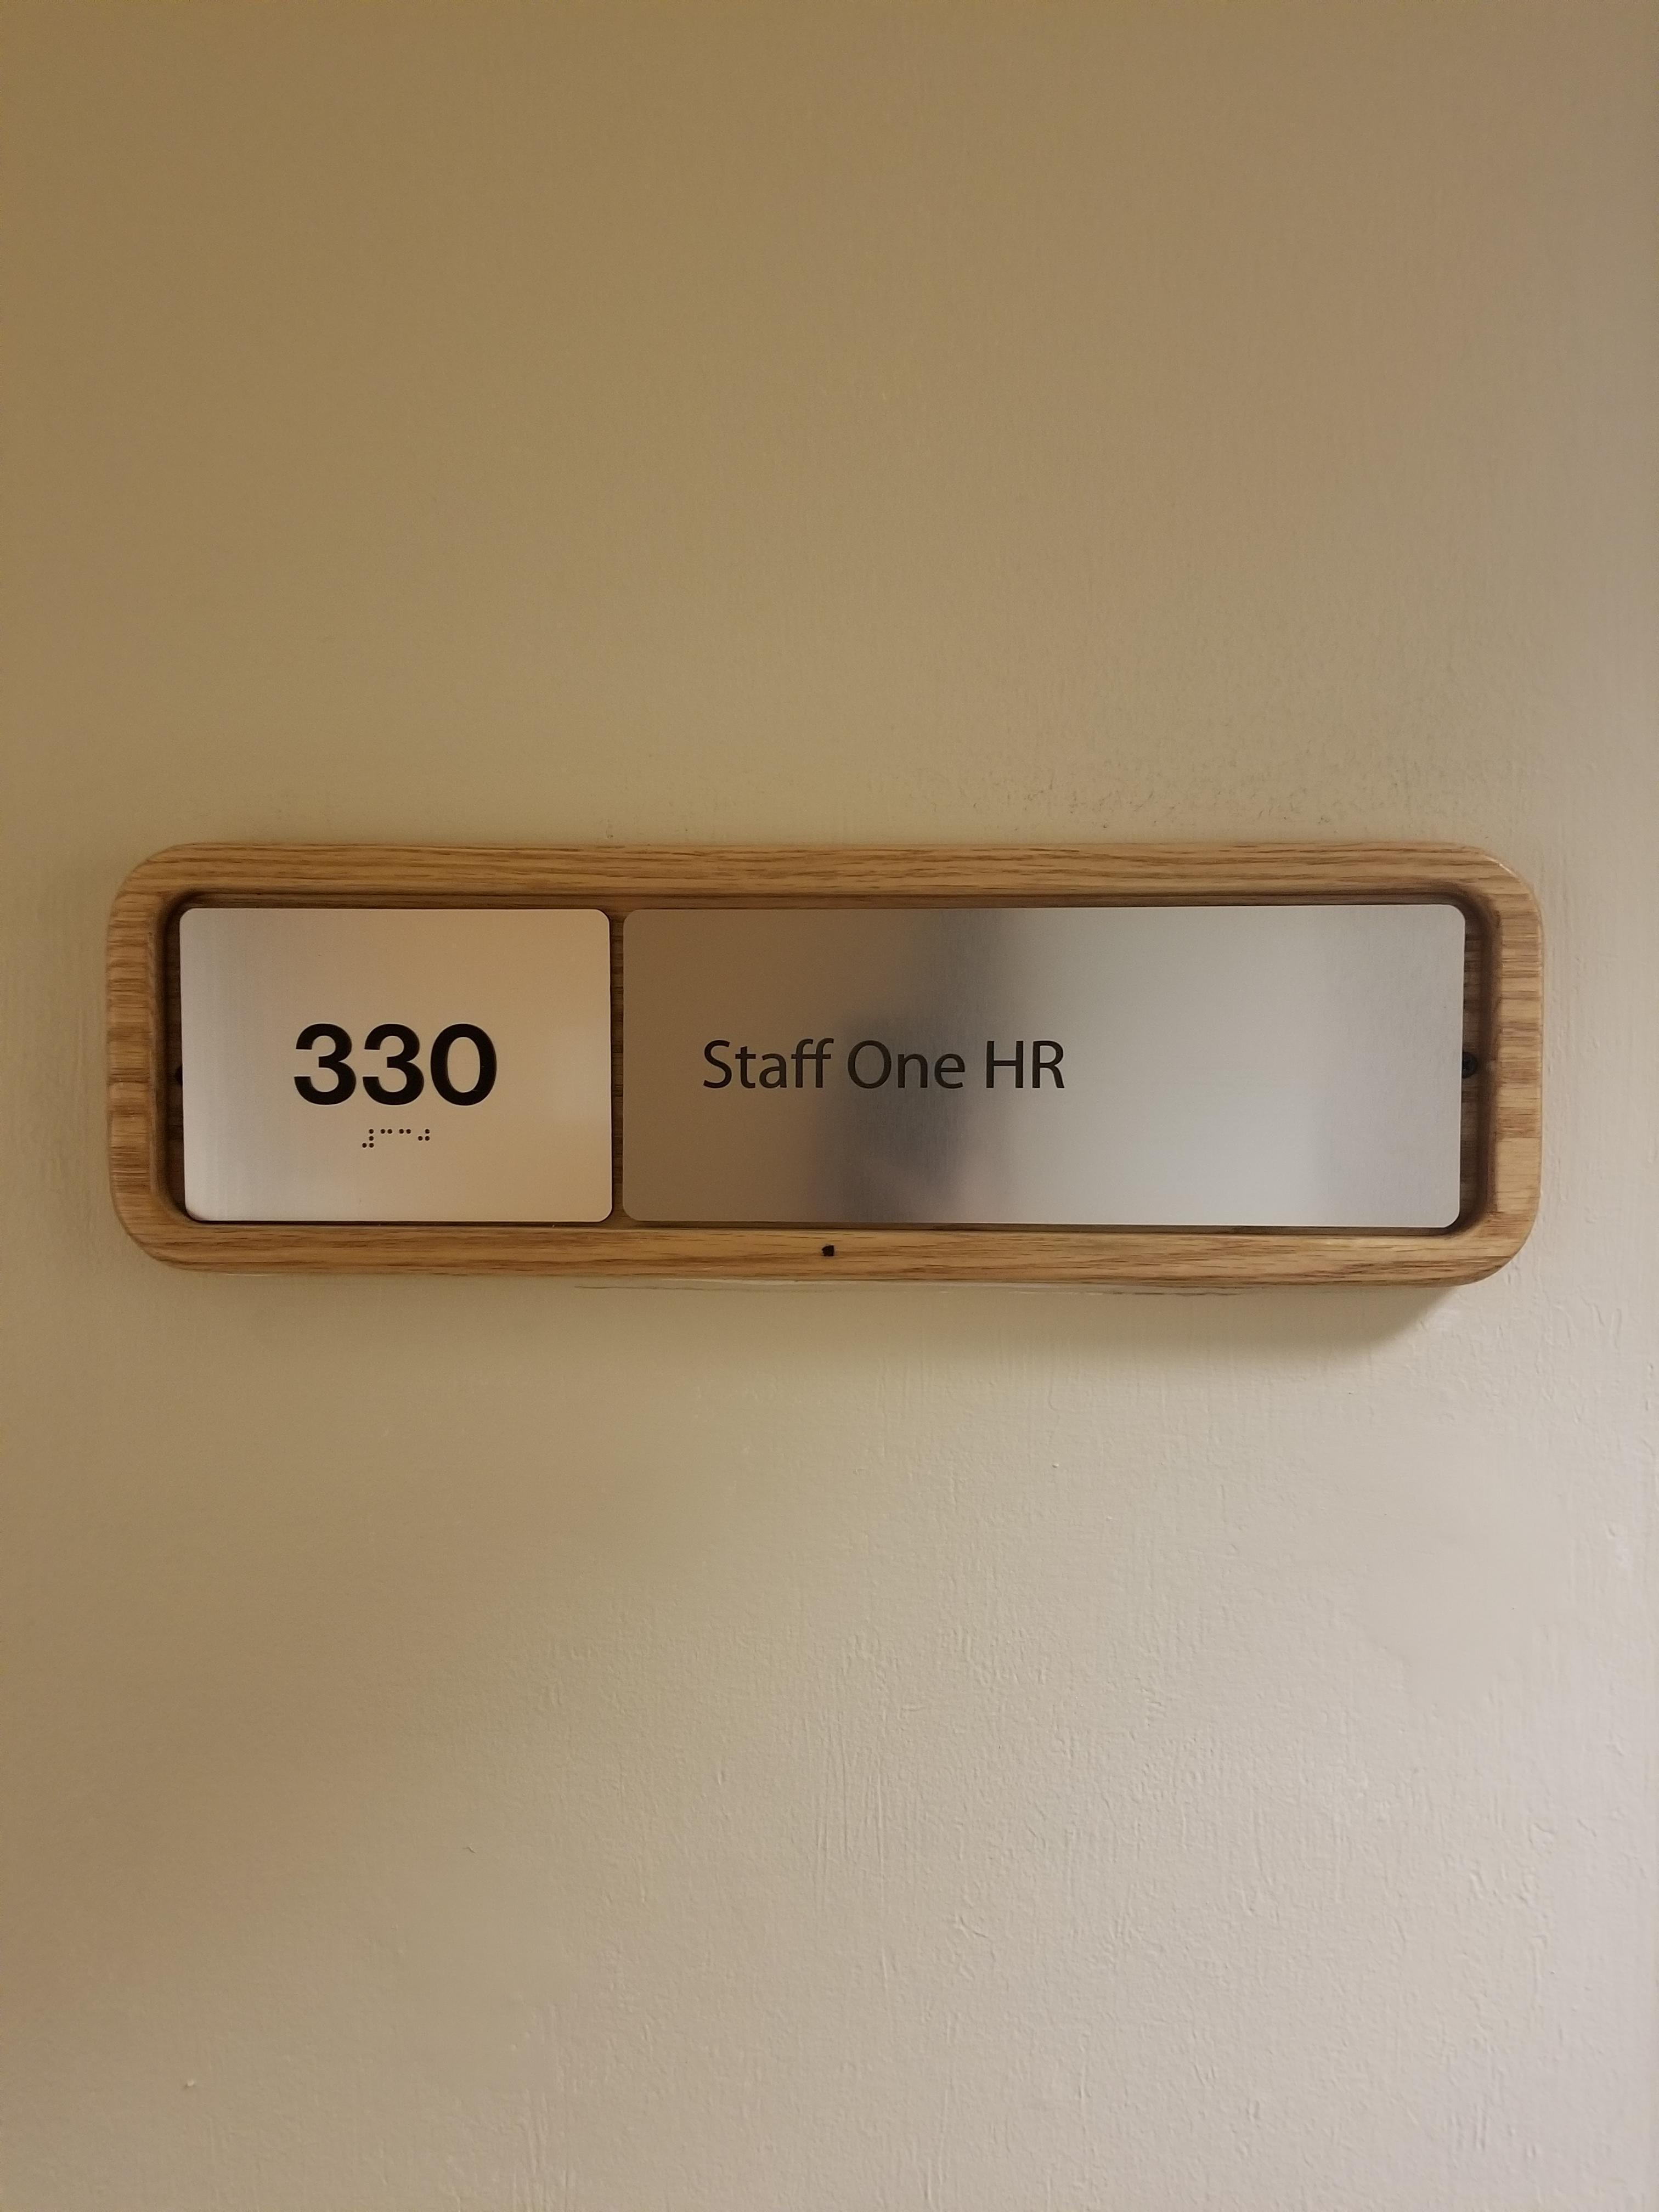 Staff One HR image 3